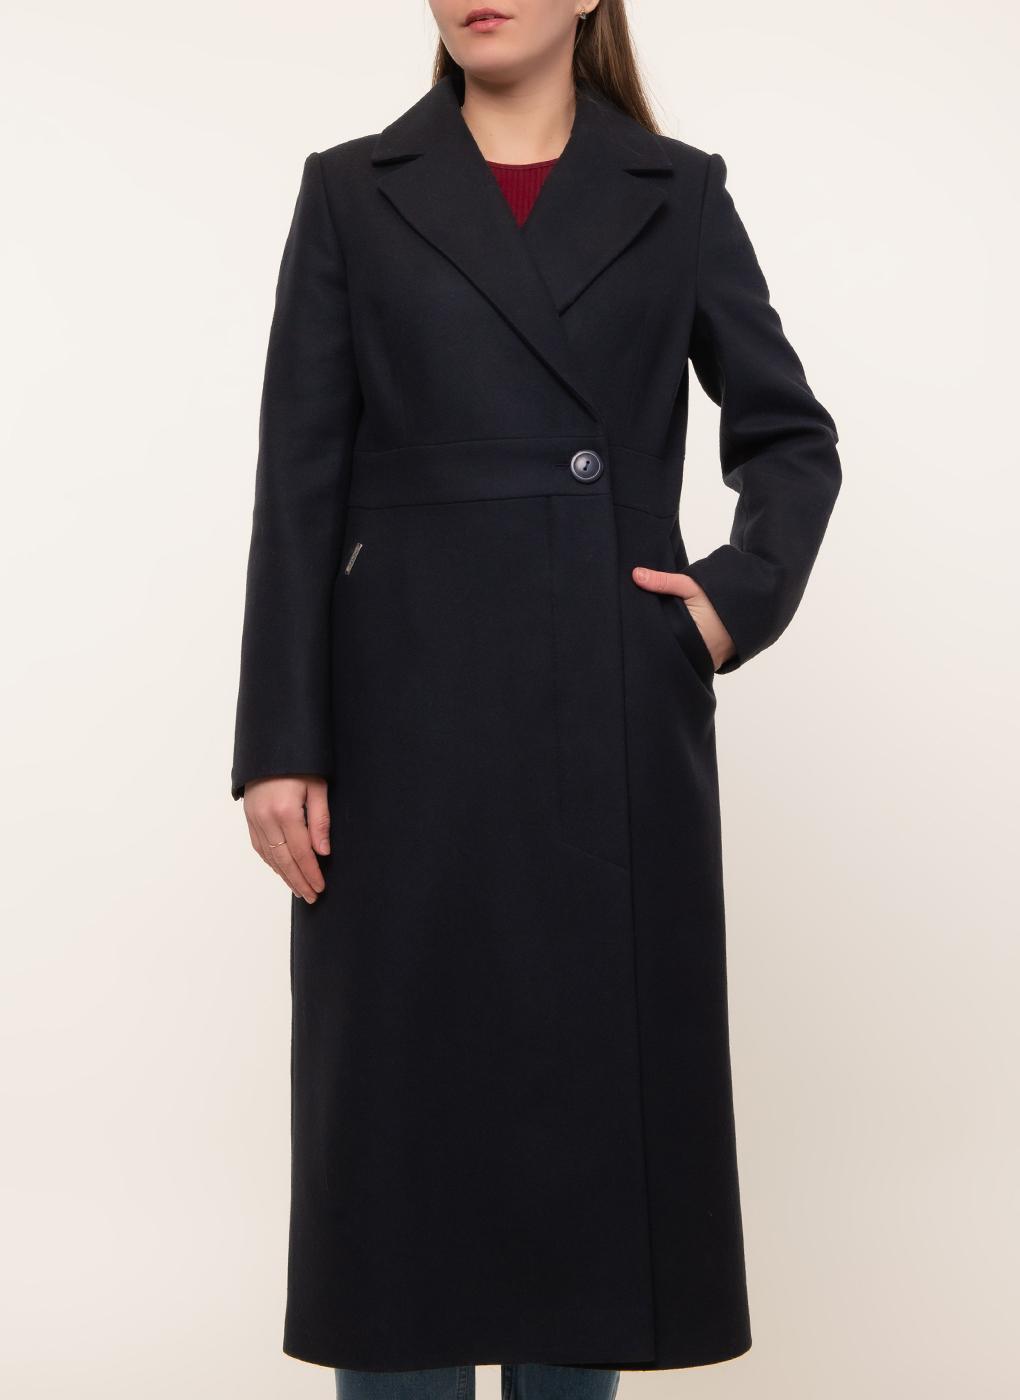 Пальто полушерстяное 90, idekka фото